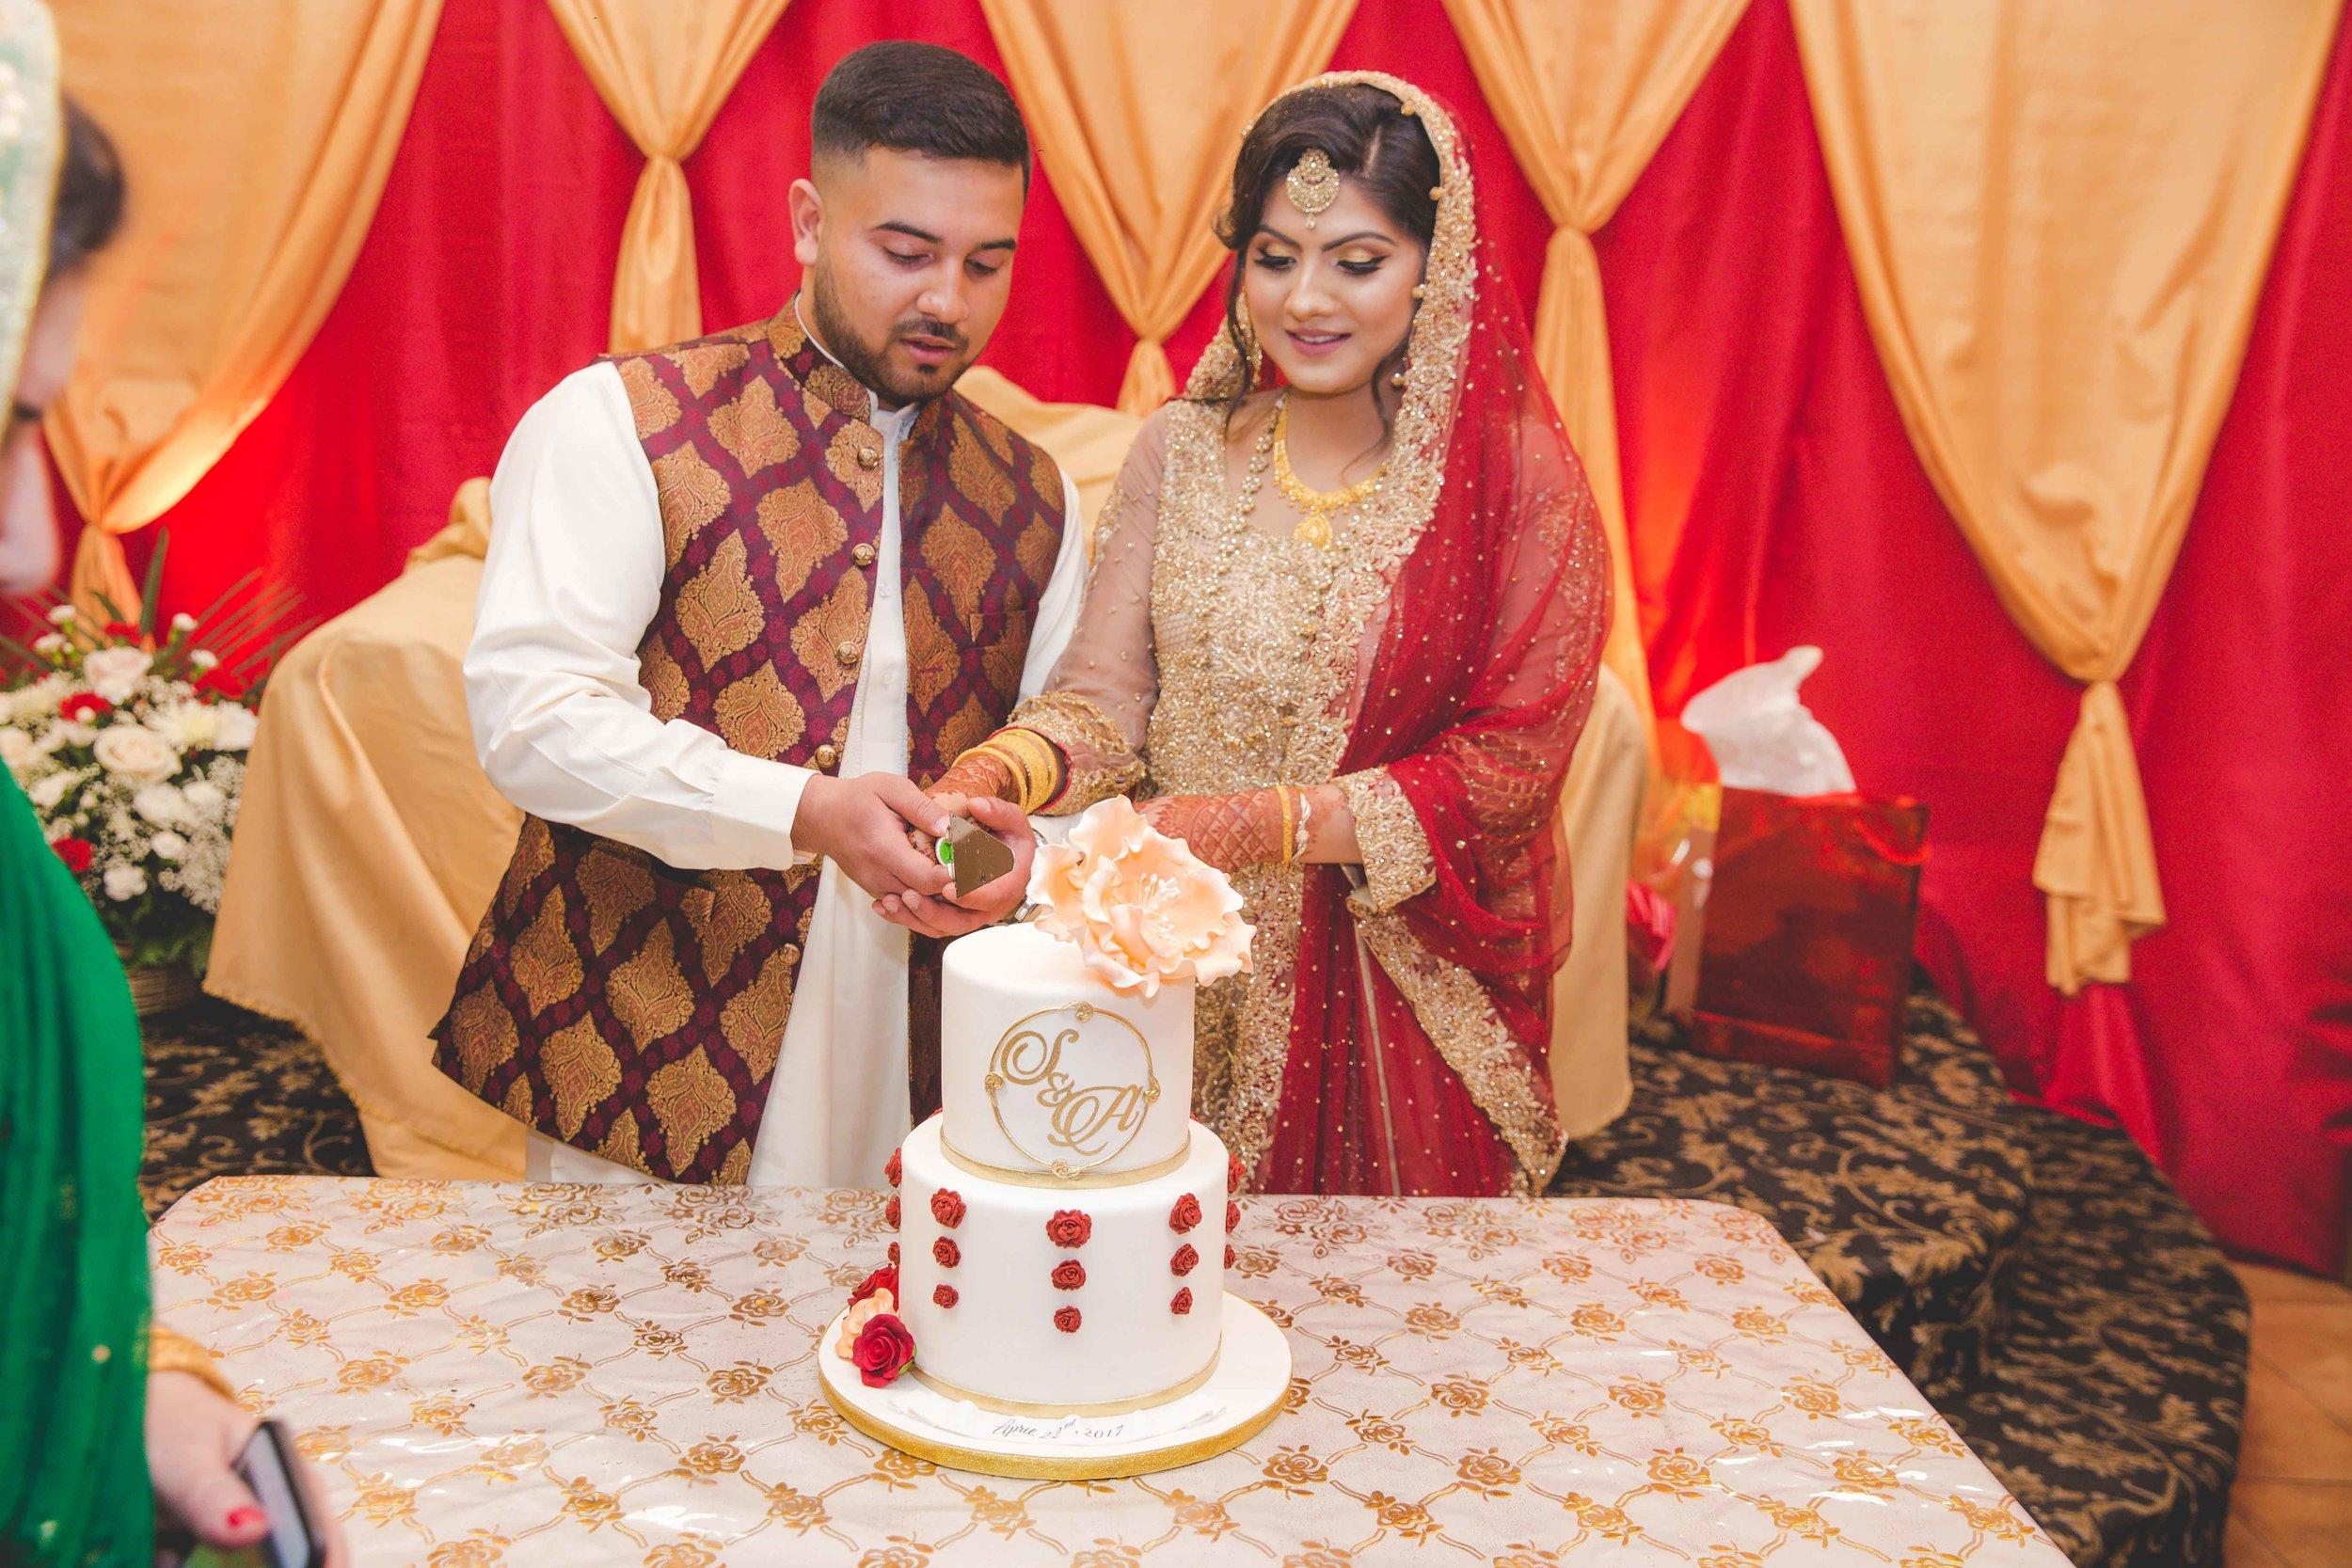 pakistani-wedding-photographer-brooklyn-new-york-25.jpg